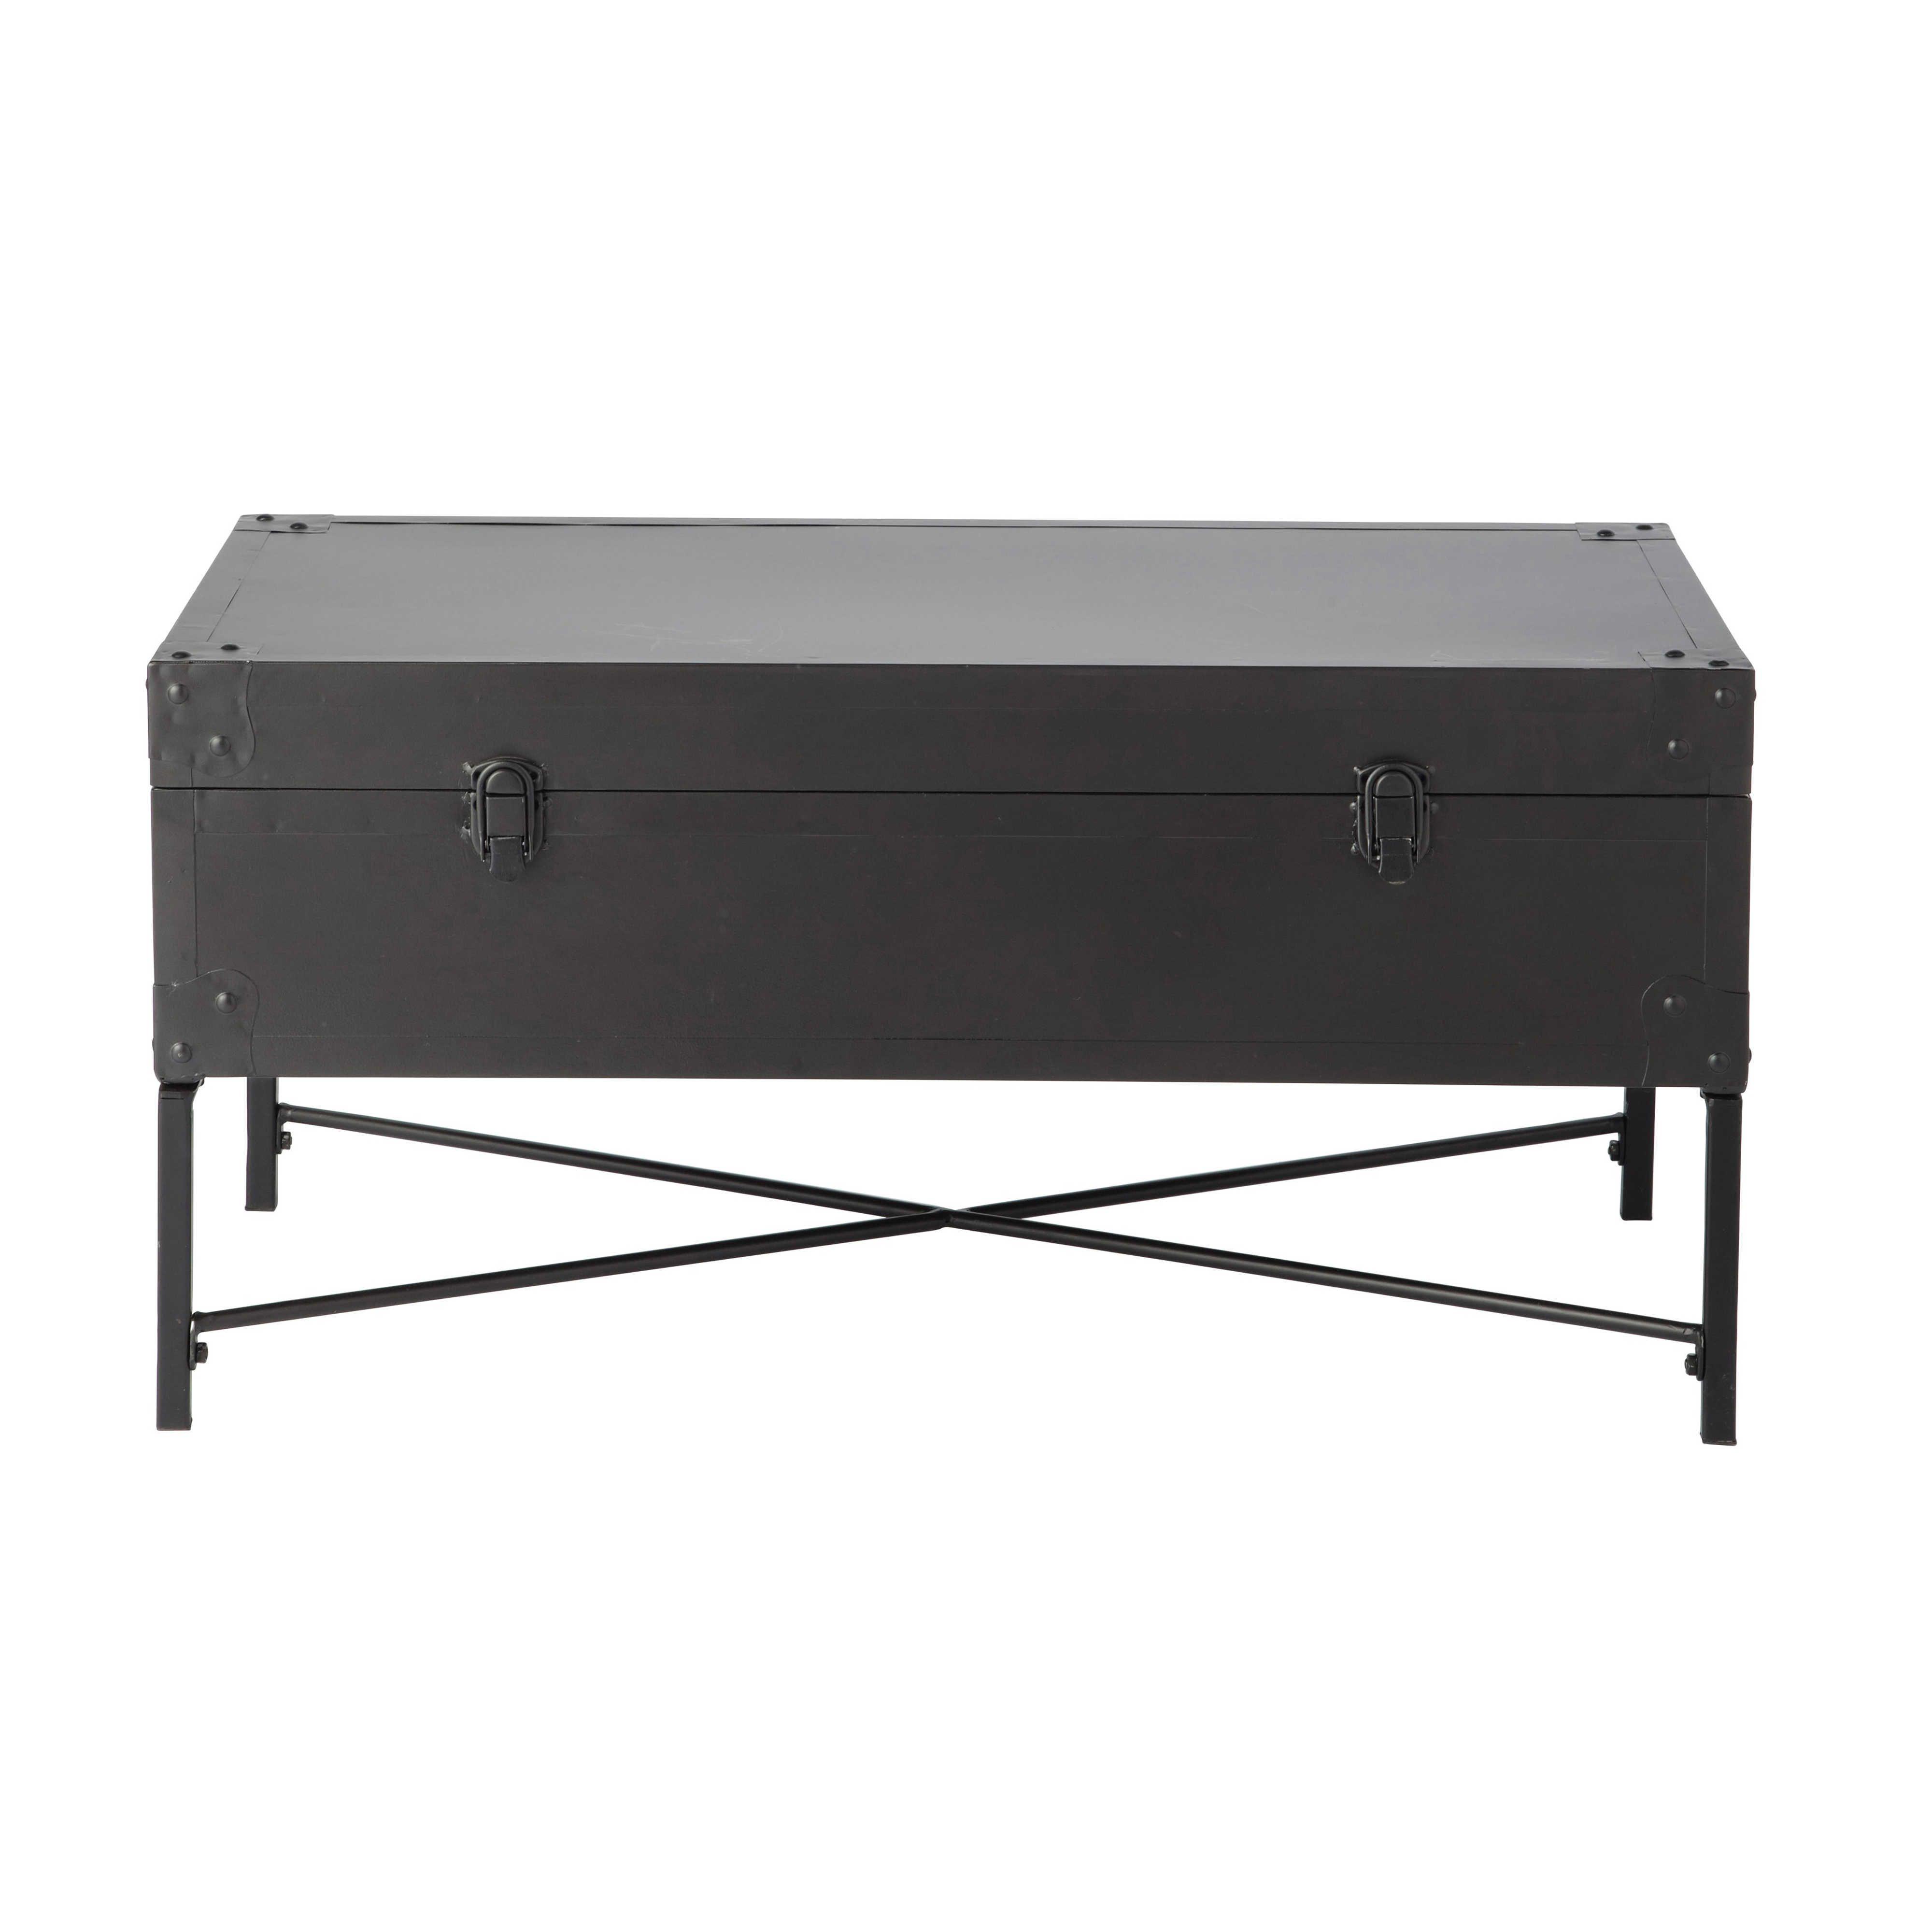 Metalltruhe EUGENE, B 72 cm, schwarz | Hallway furniture | Pinterest